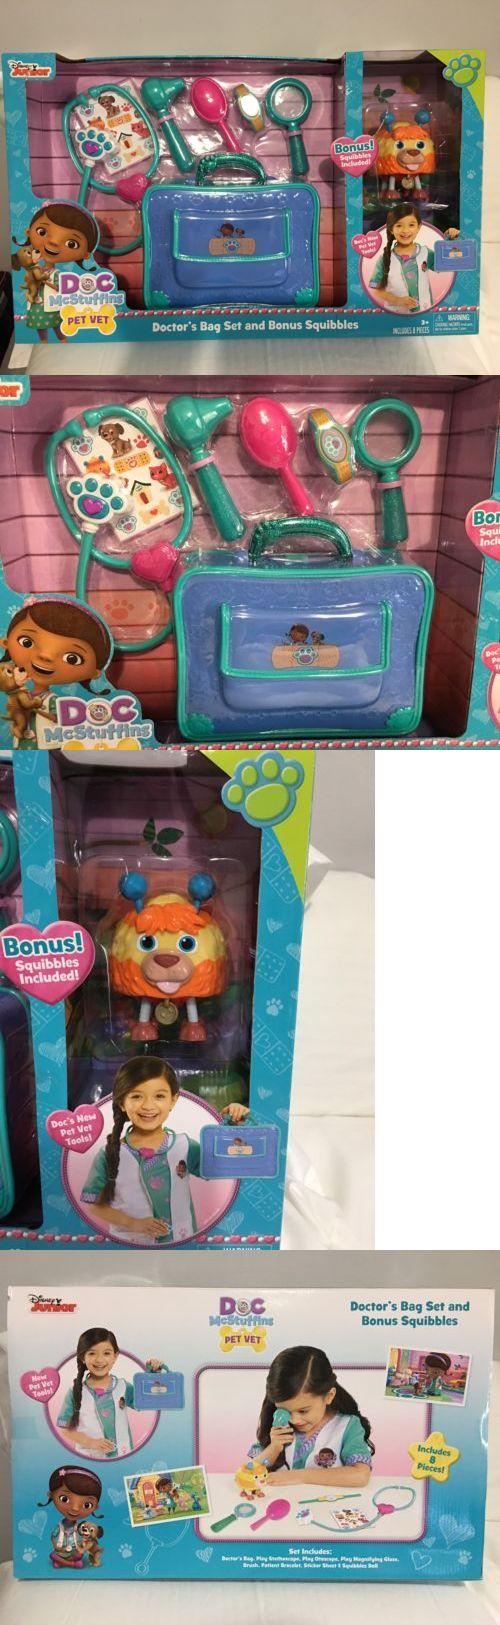 Doctor Nurse Kits 158741: Disney Doc Mcstuffin S Pet Vet Bag Set With Bonus Squabbles -> BUY IT NOW ONLY: $32.35 on eBay!